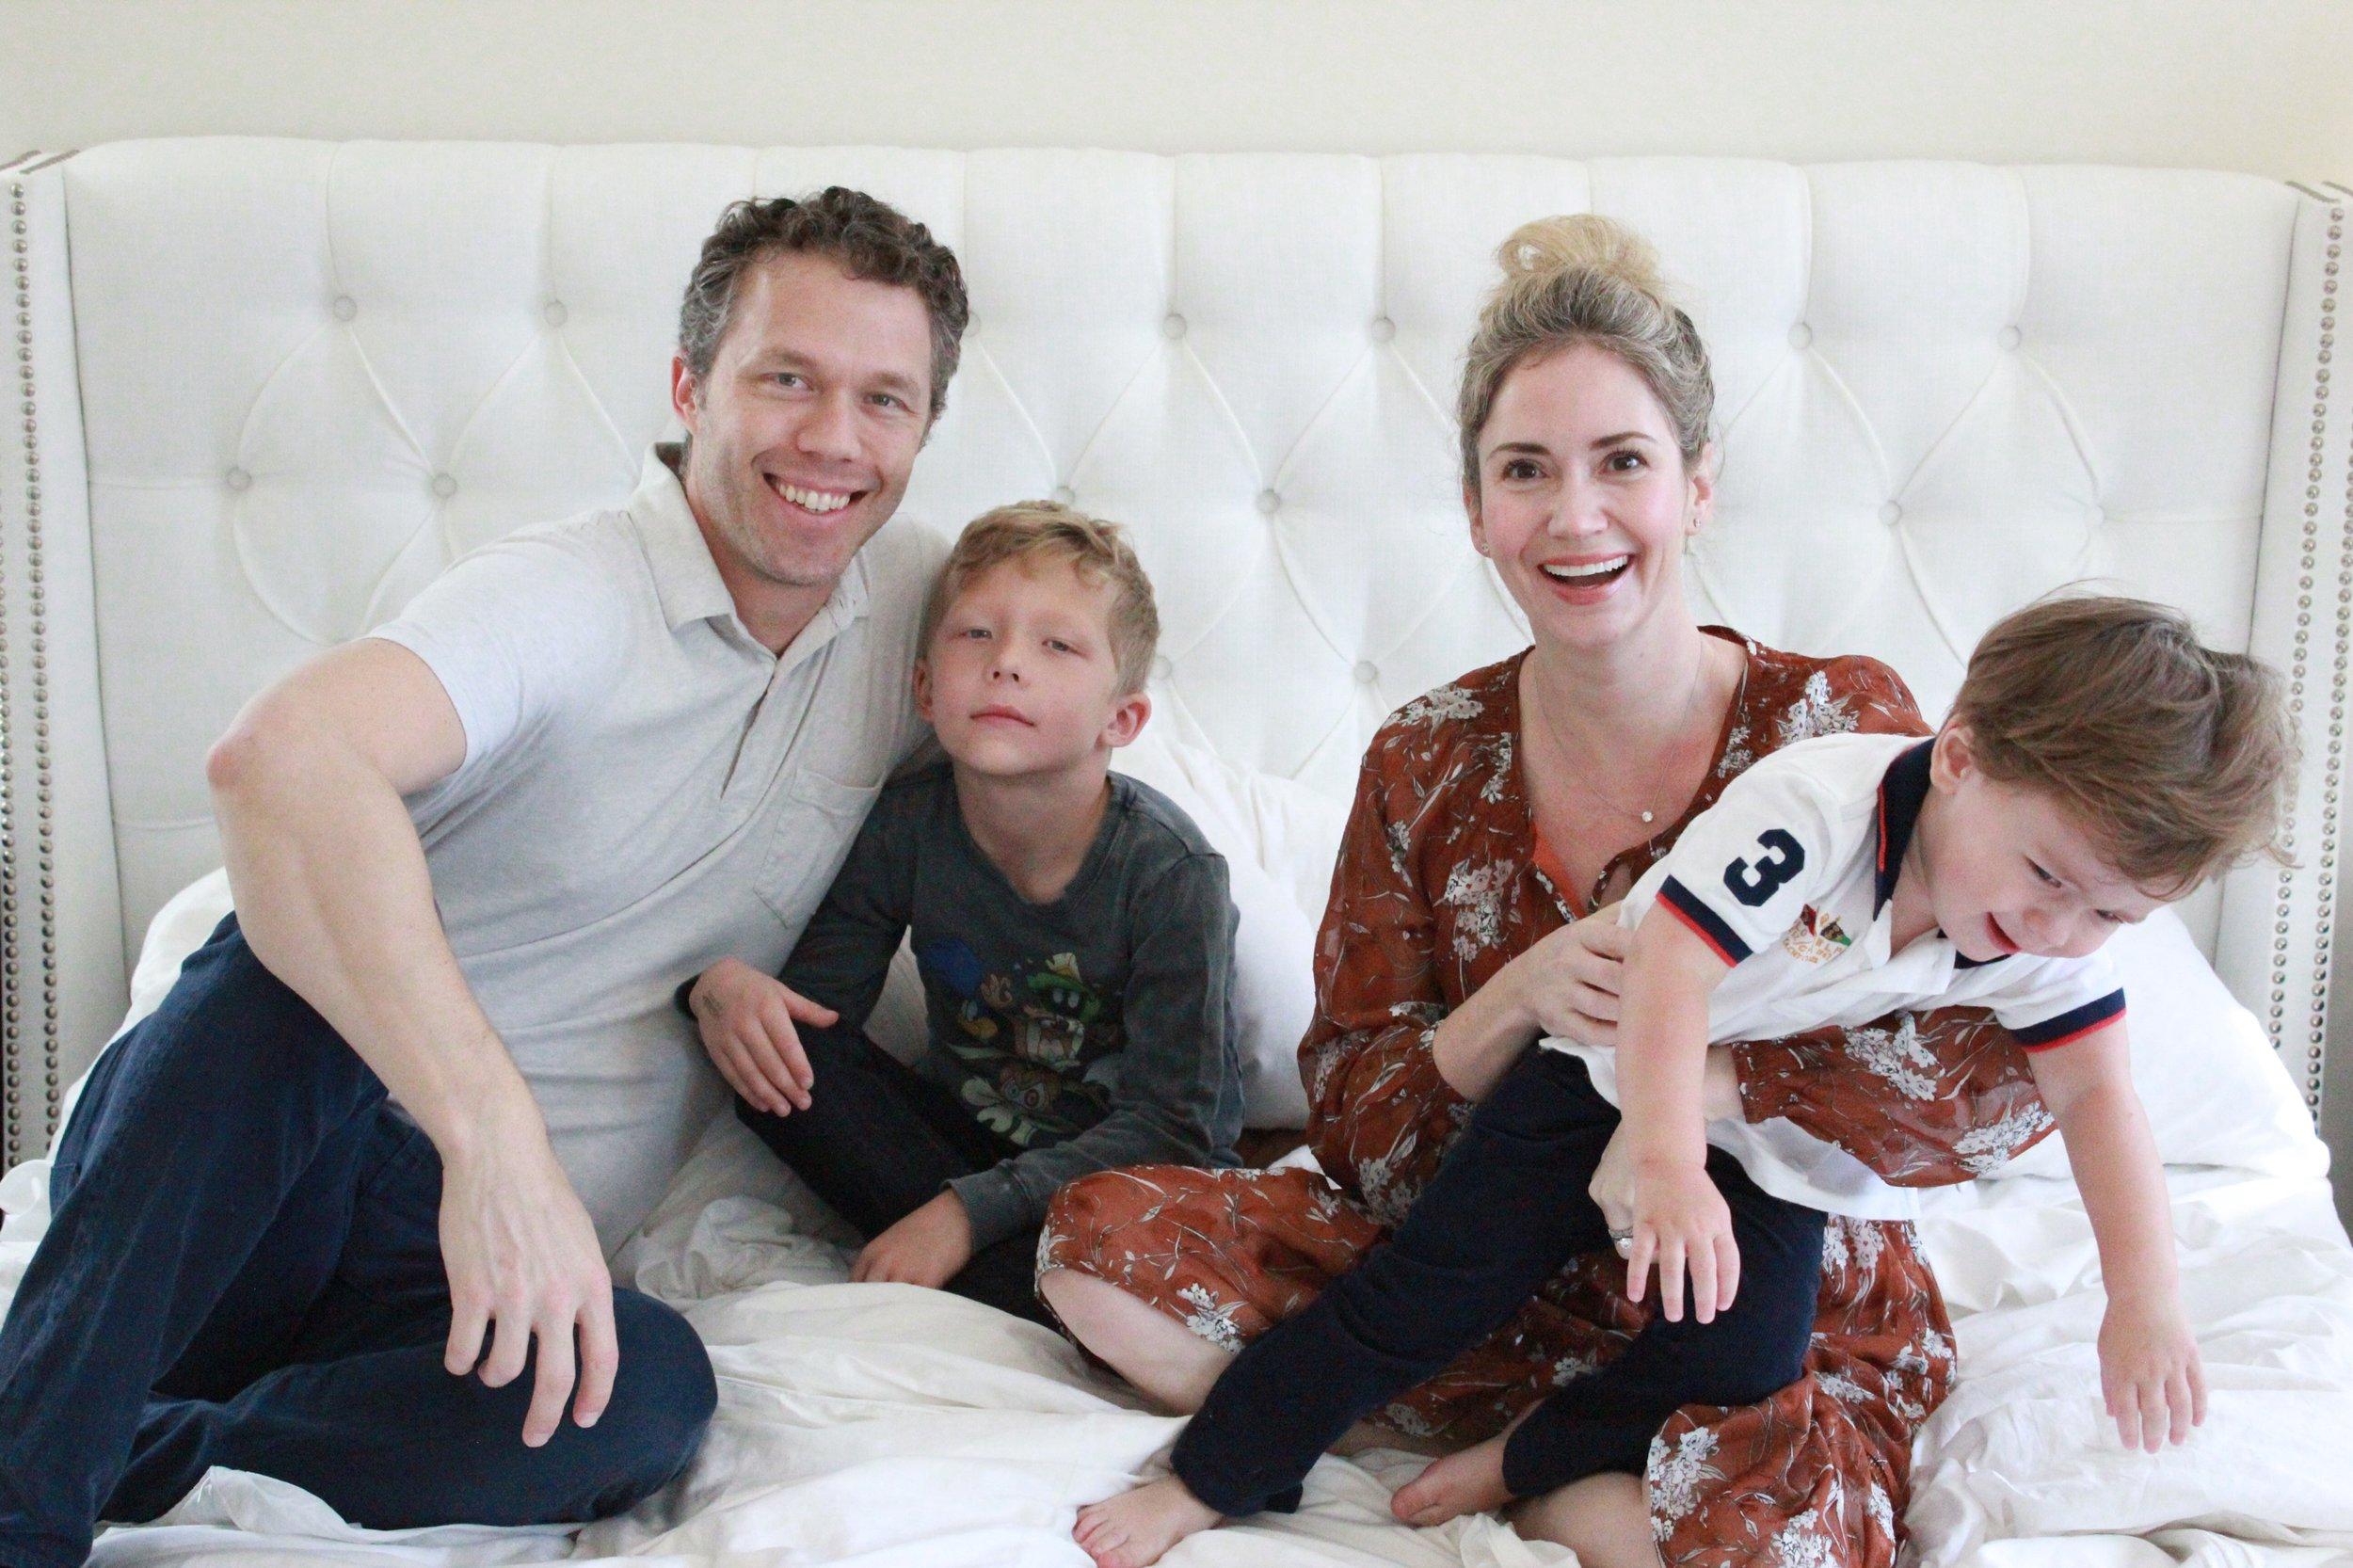 family picturew 2018.JPG